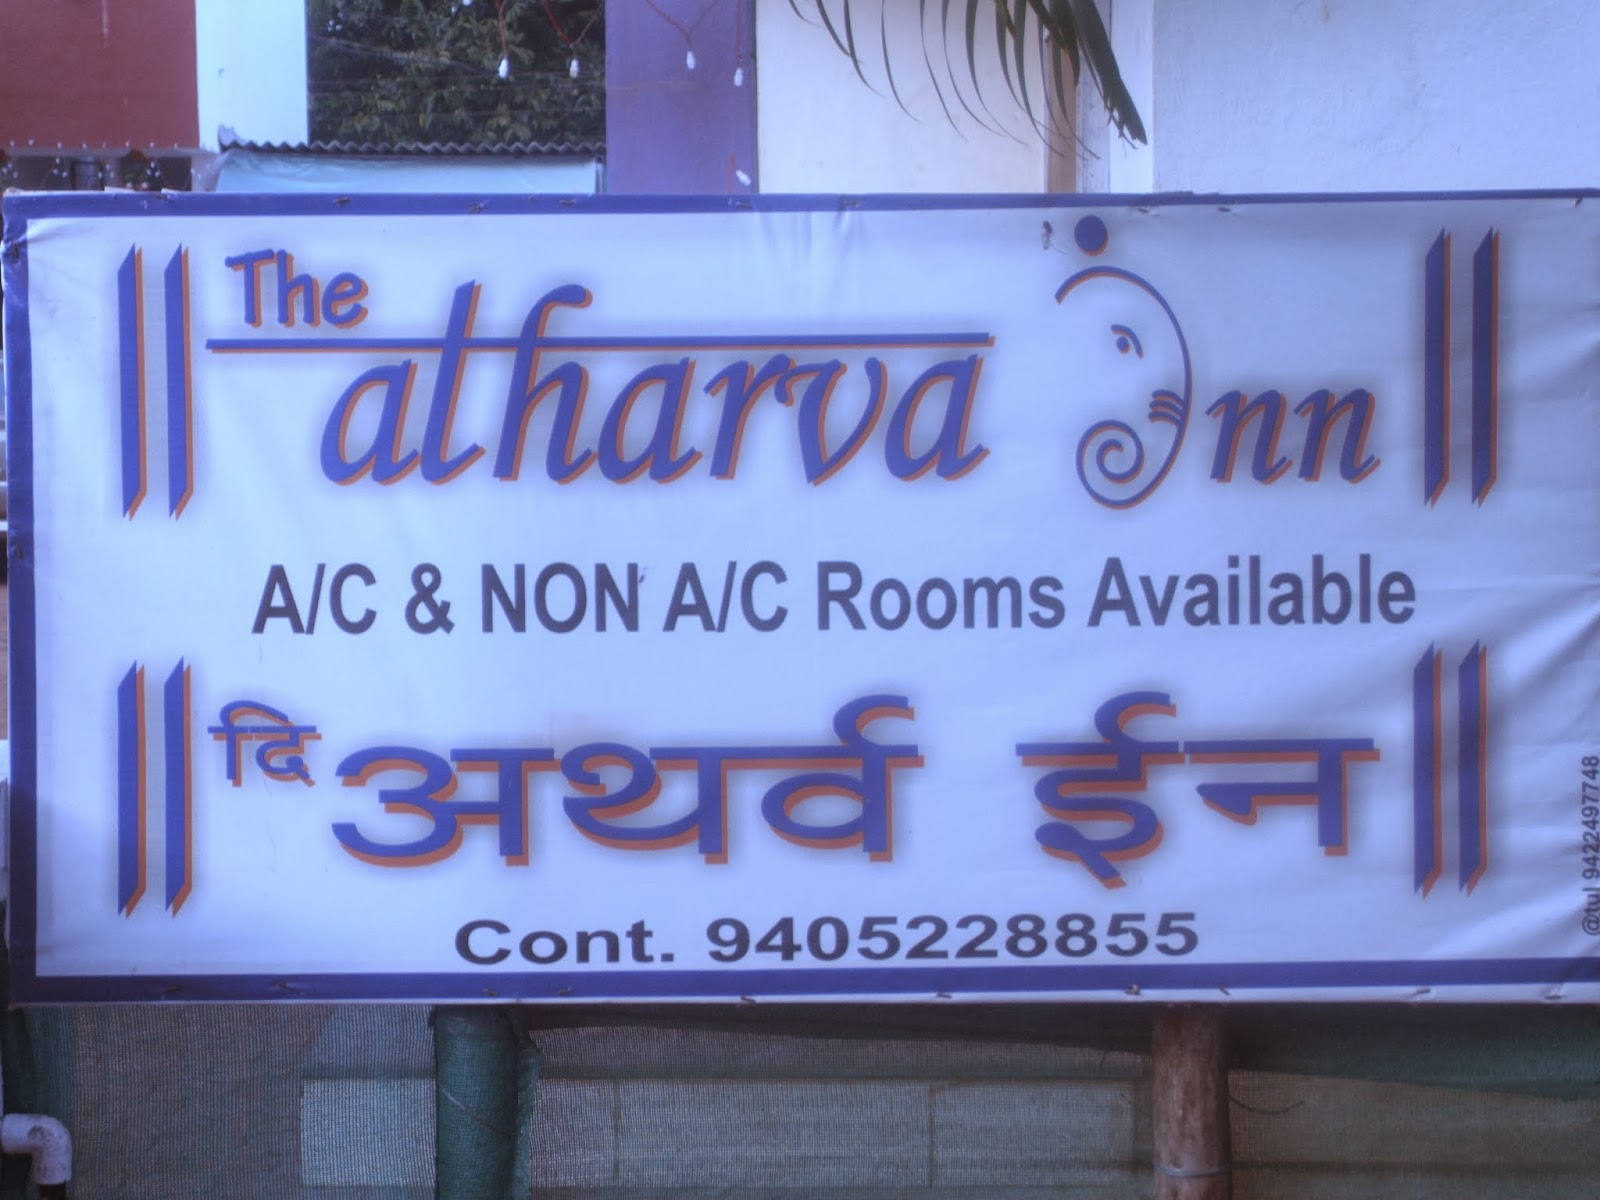 The Atharva Inn